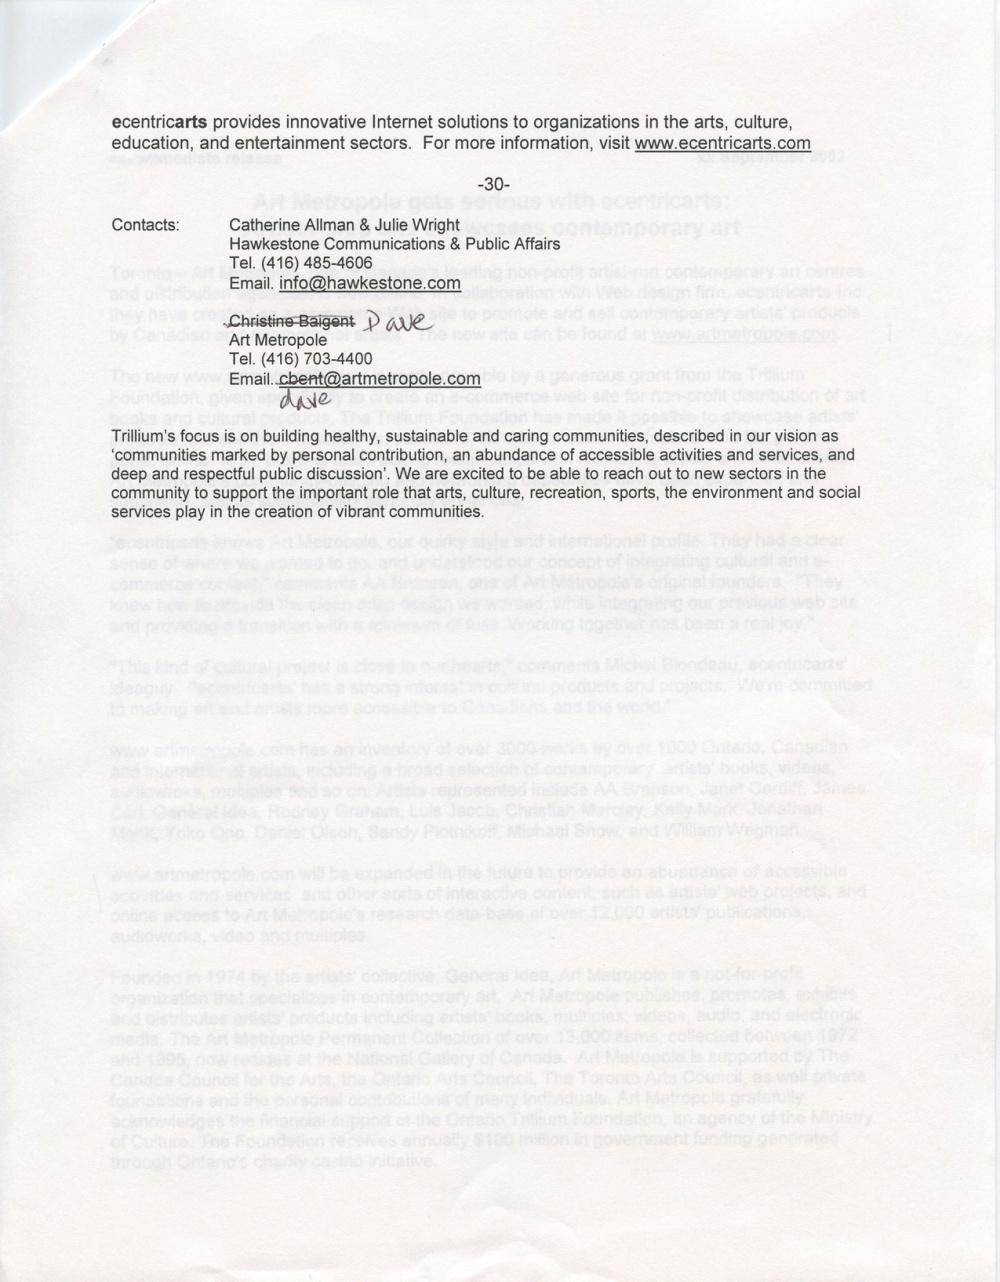 AMA0201, page 2